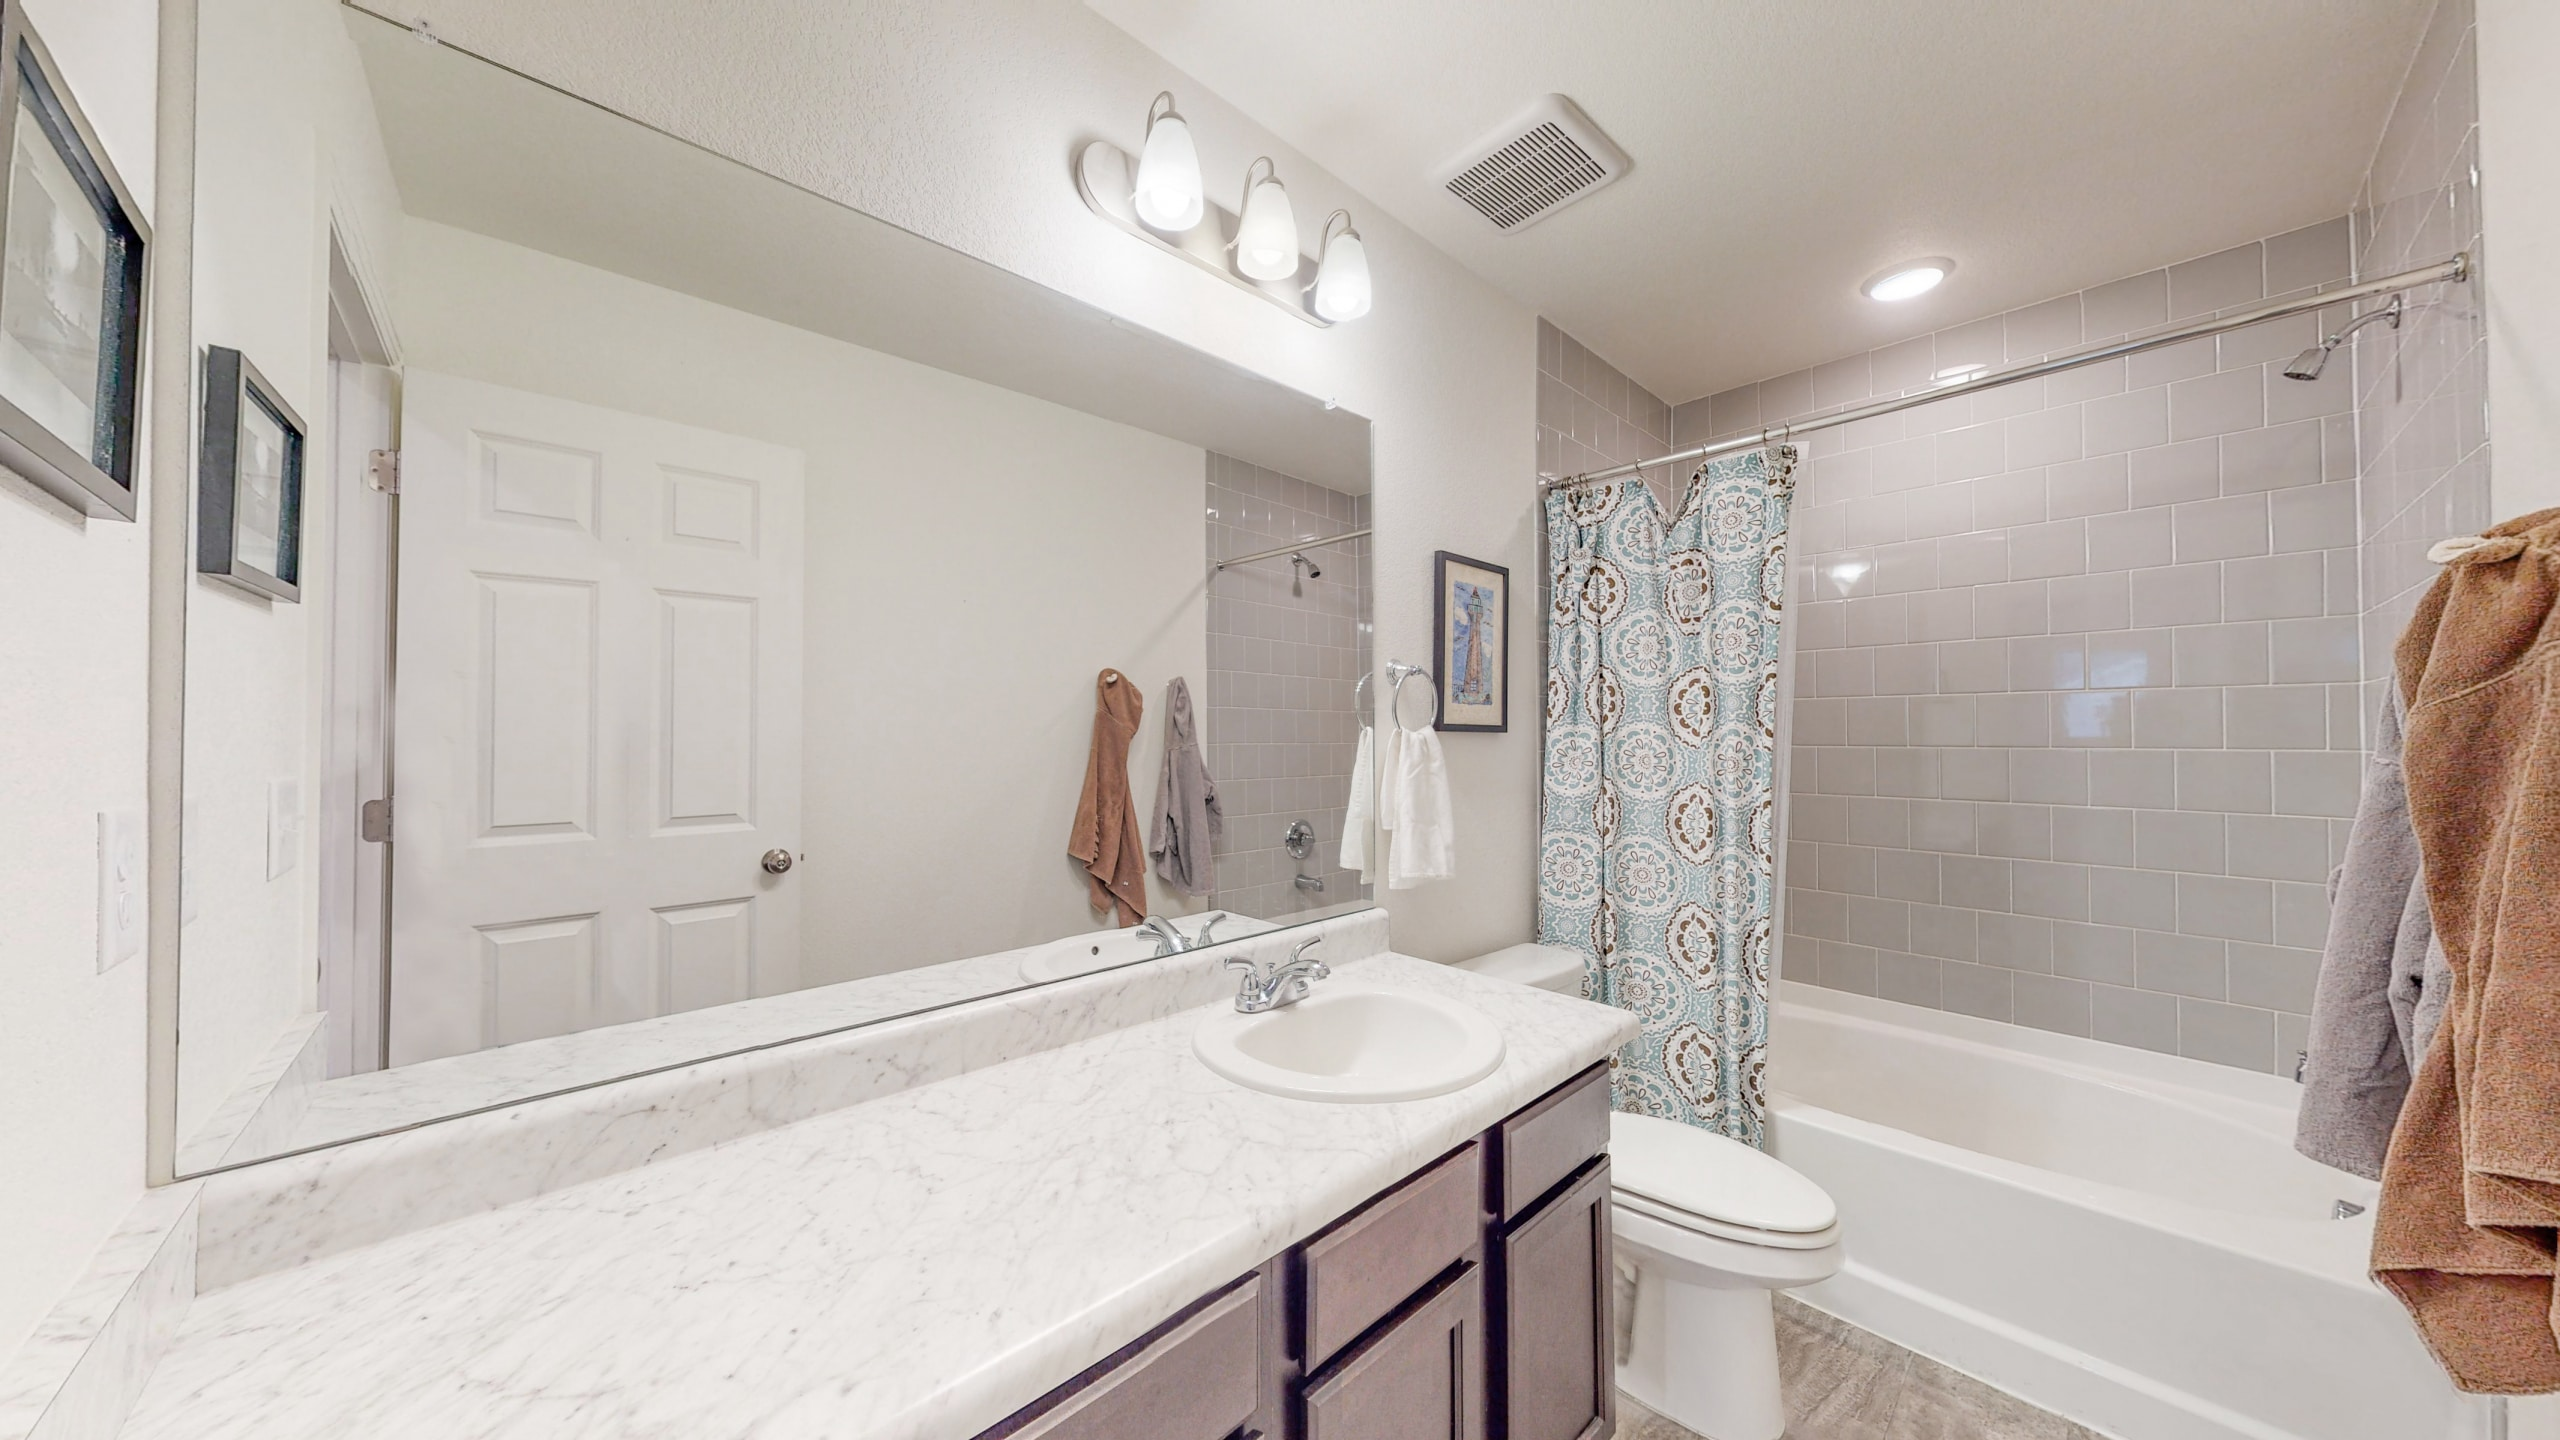 Upstairs Extra Full Bathroom, Grey subway tile, large vanity